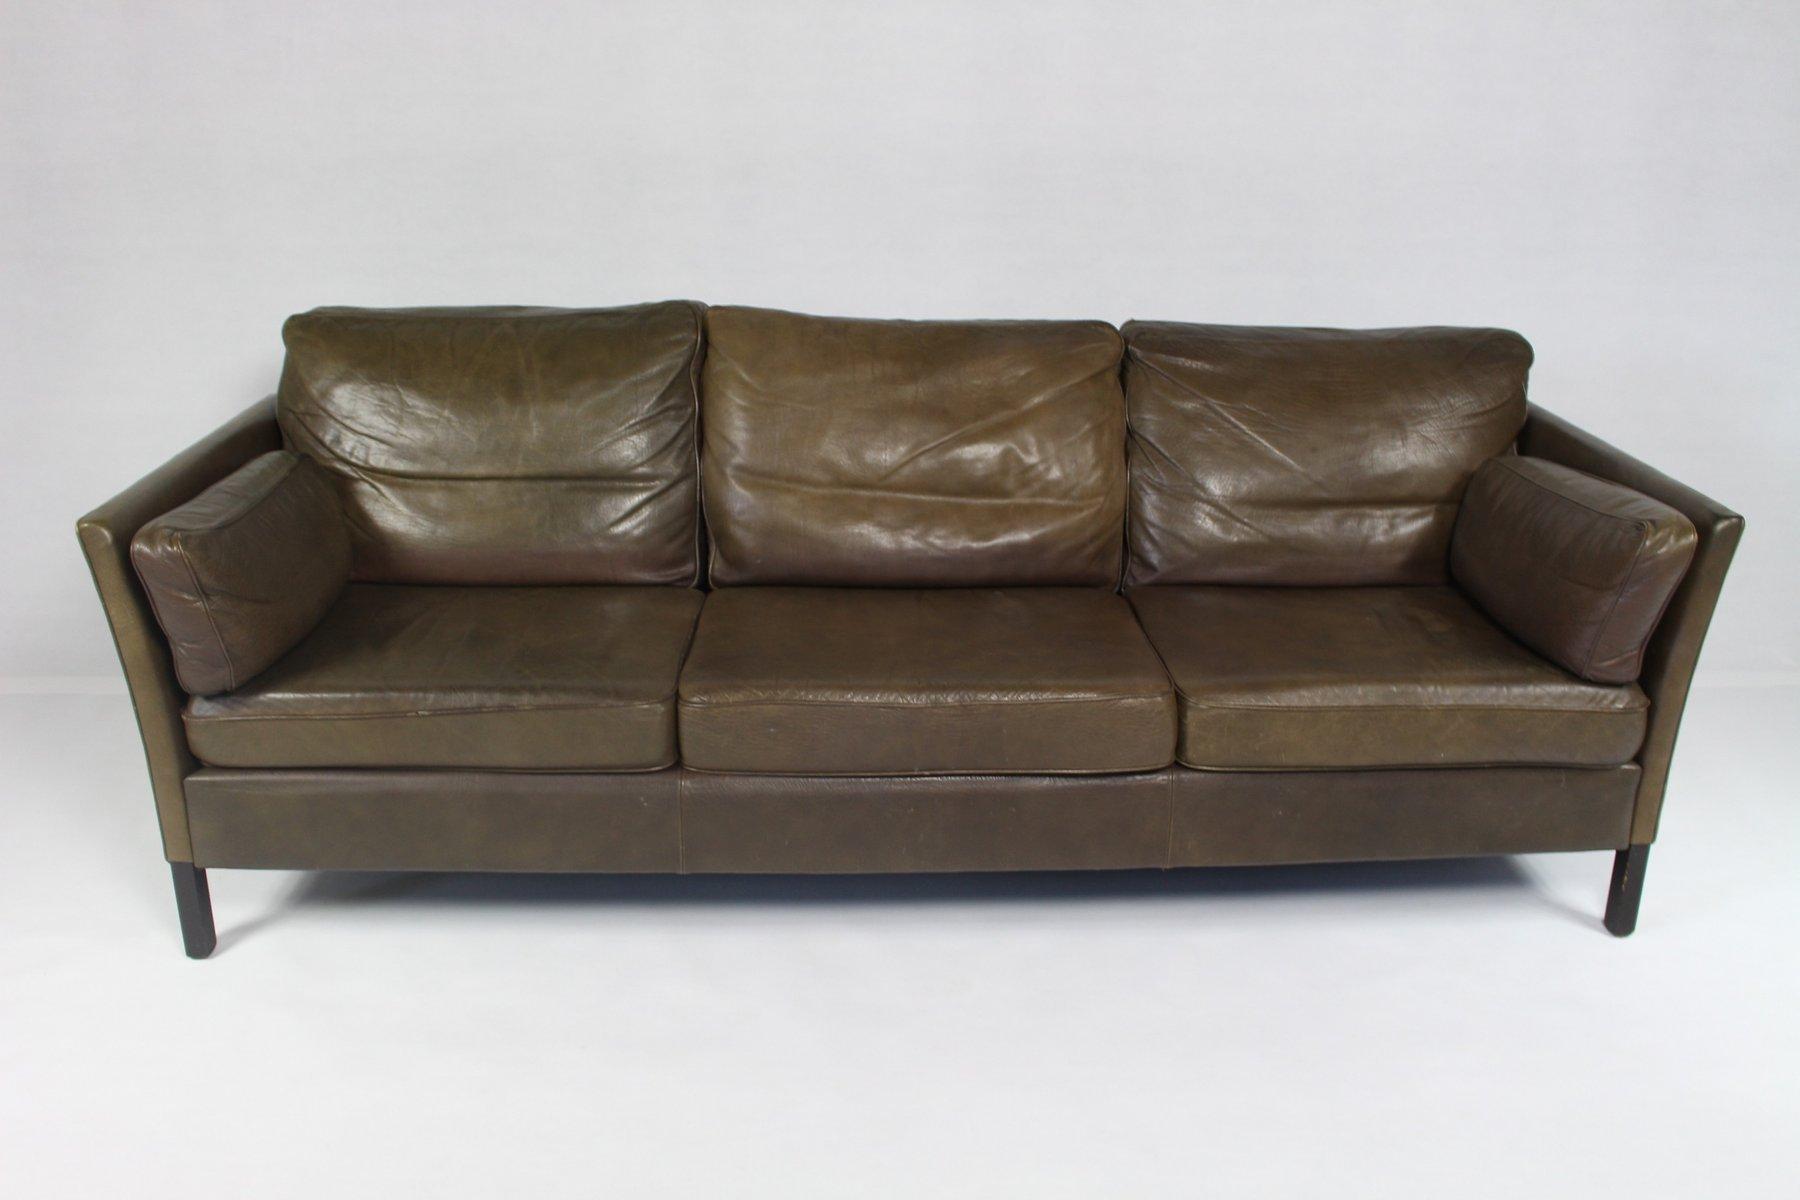 d nisches sofa von vejen polsterm belfabrik f r georg. Black Bedroom Furniture Sets. Home Design Ideas